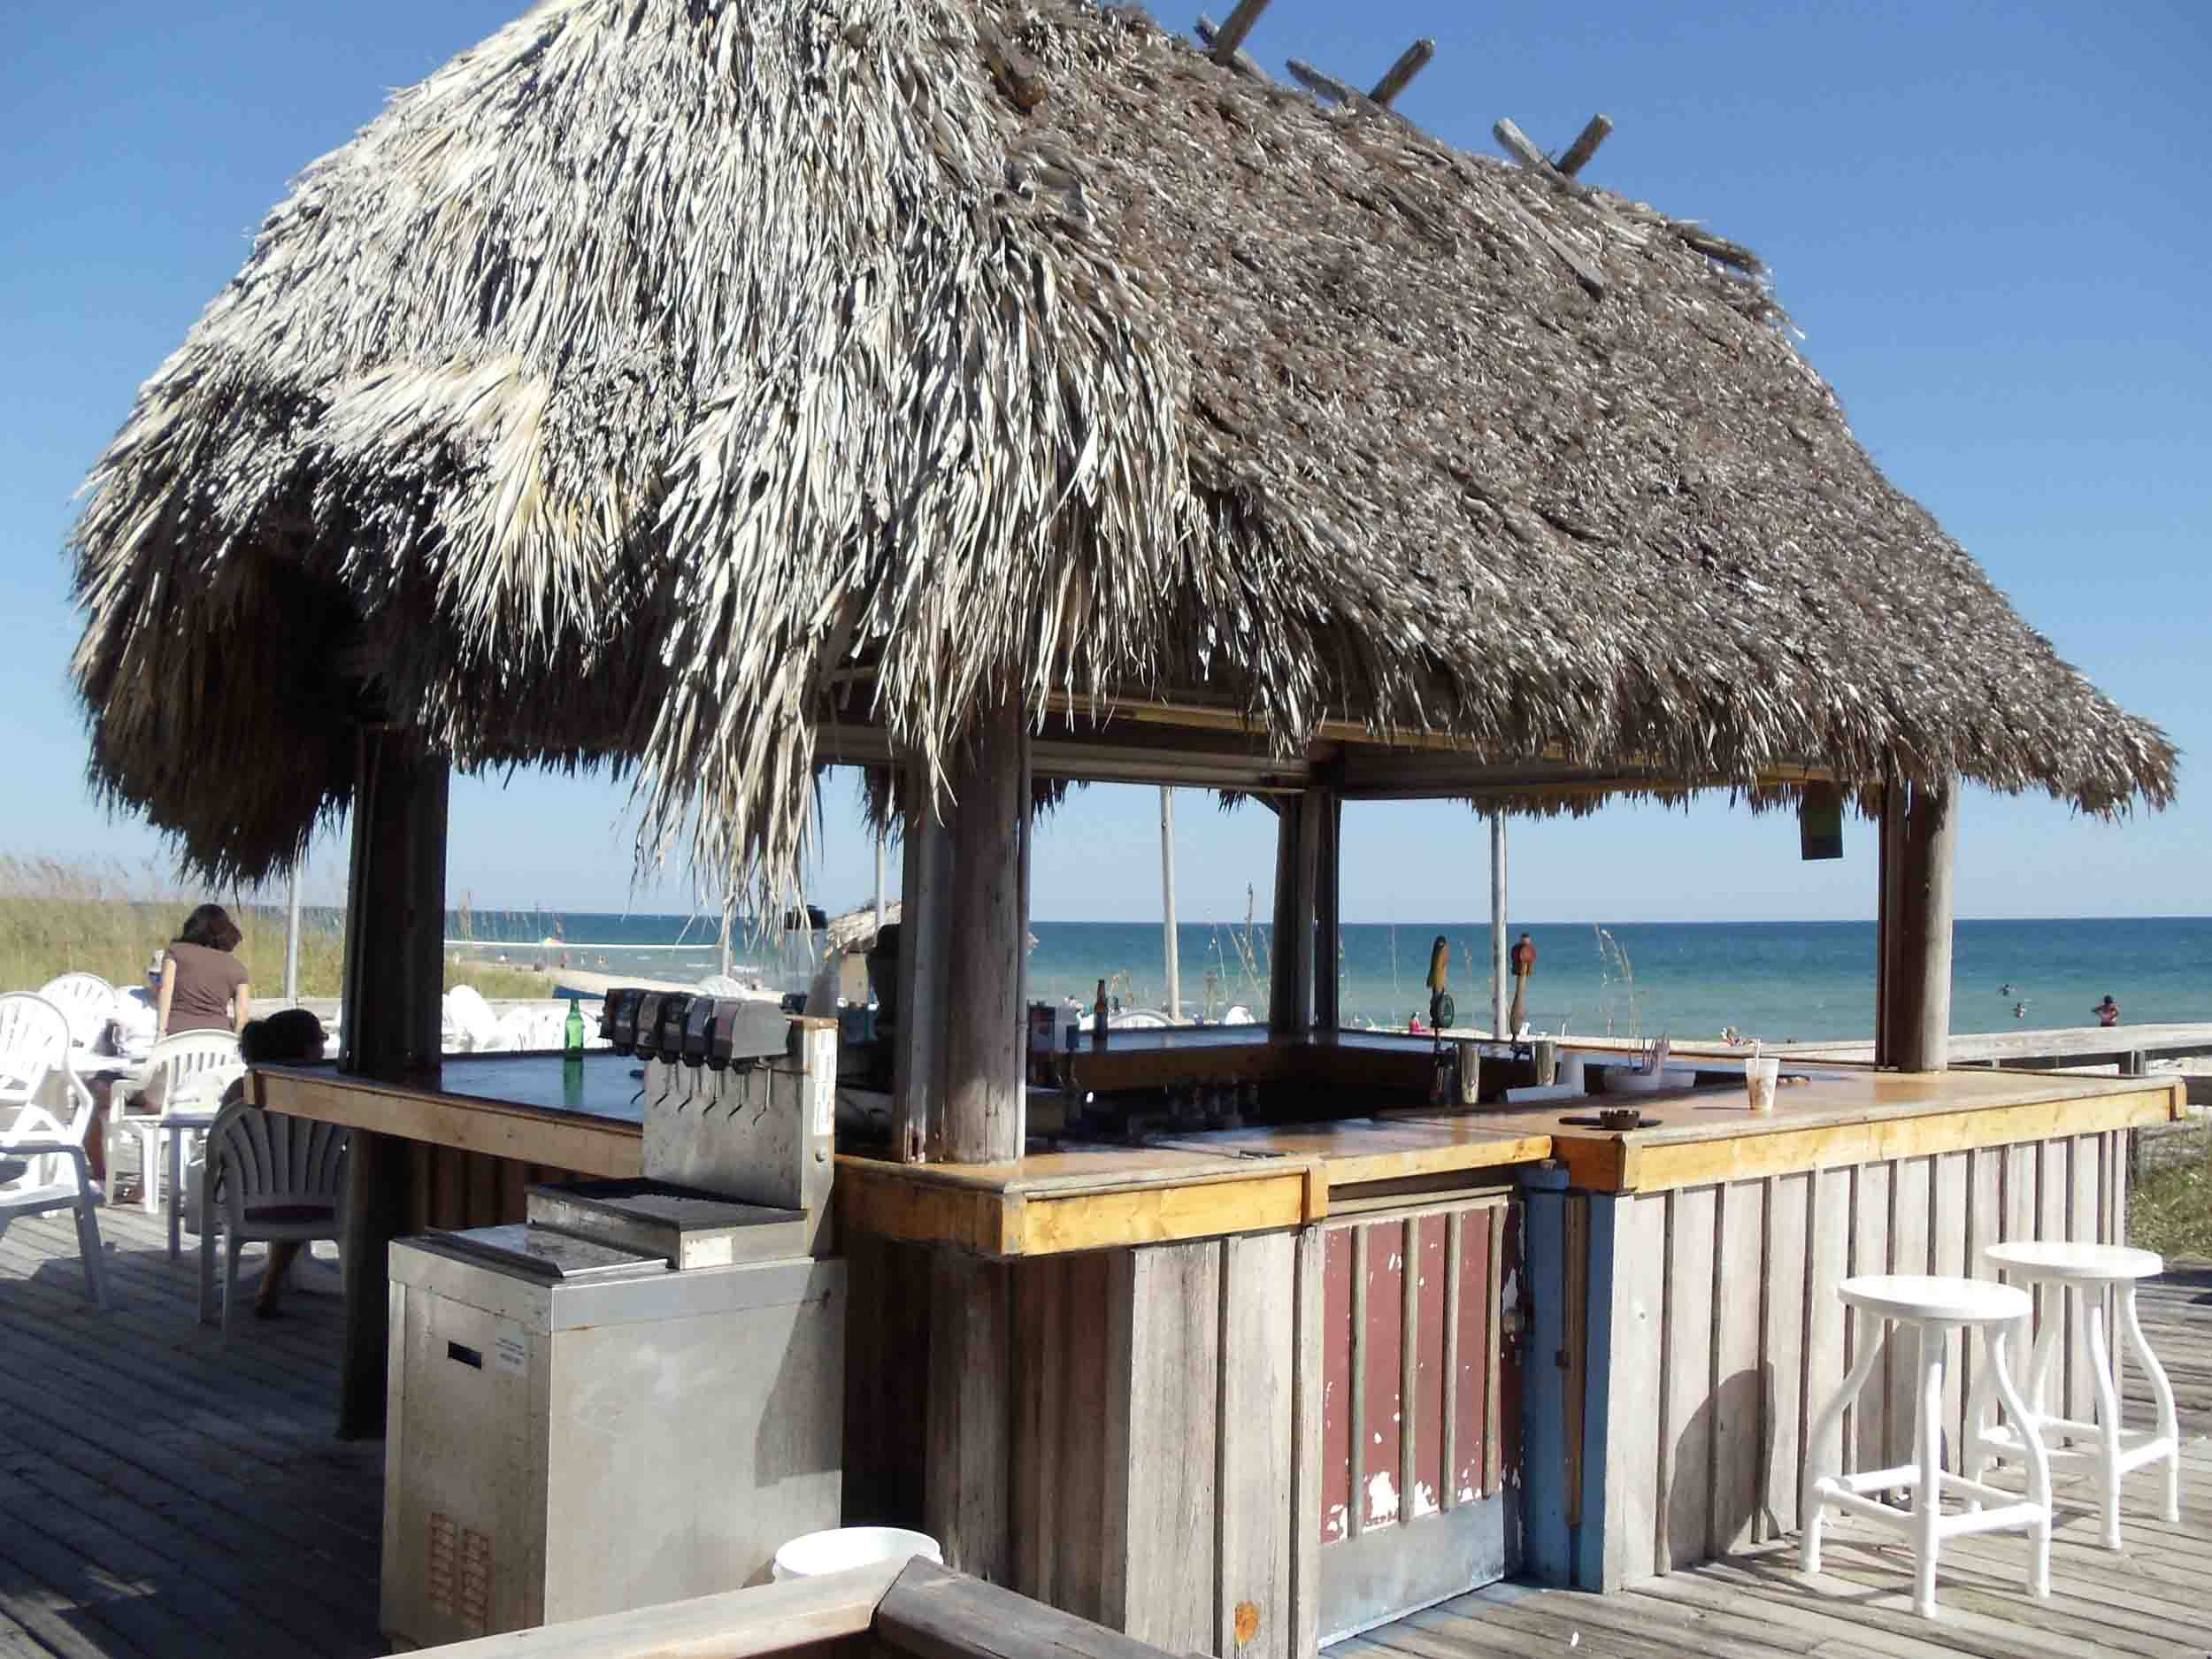 The Blue Parrot Oceanfront Cafe Tiki Bar